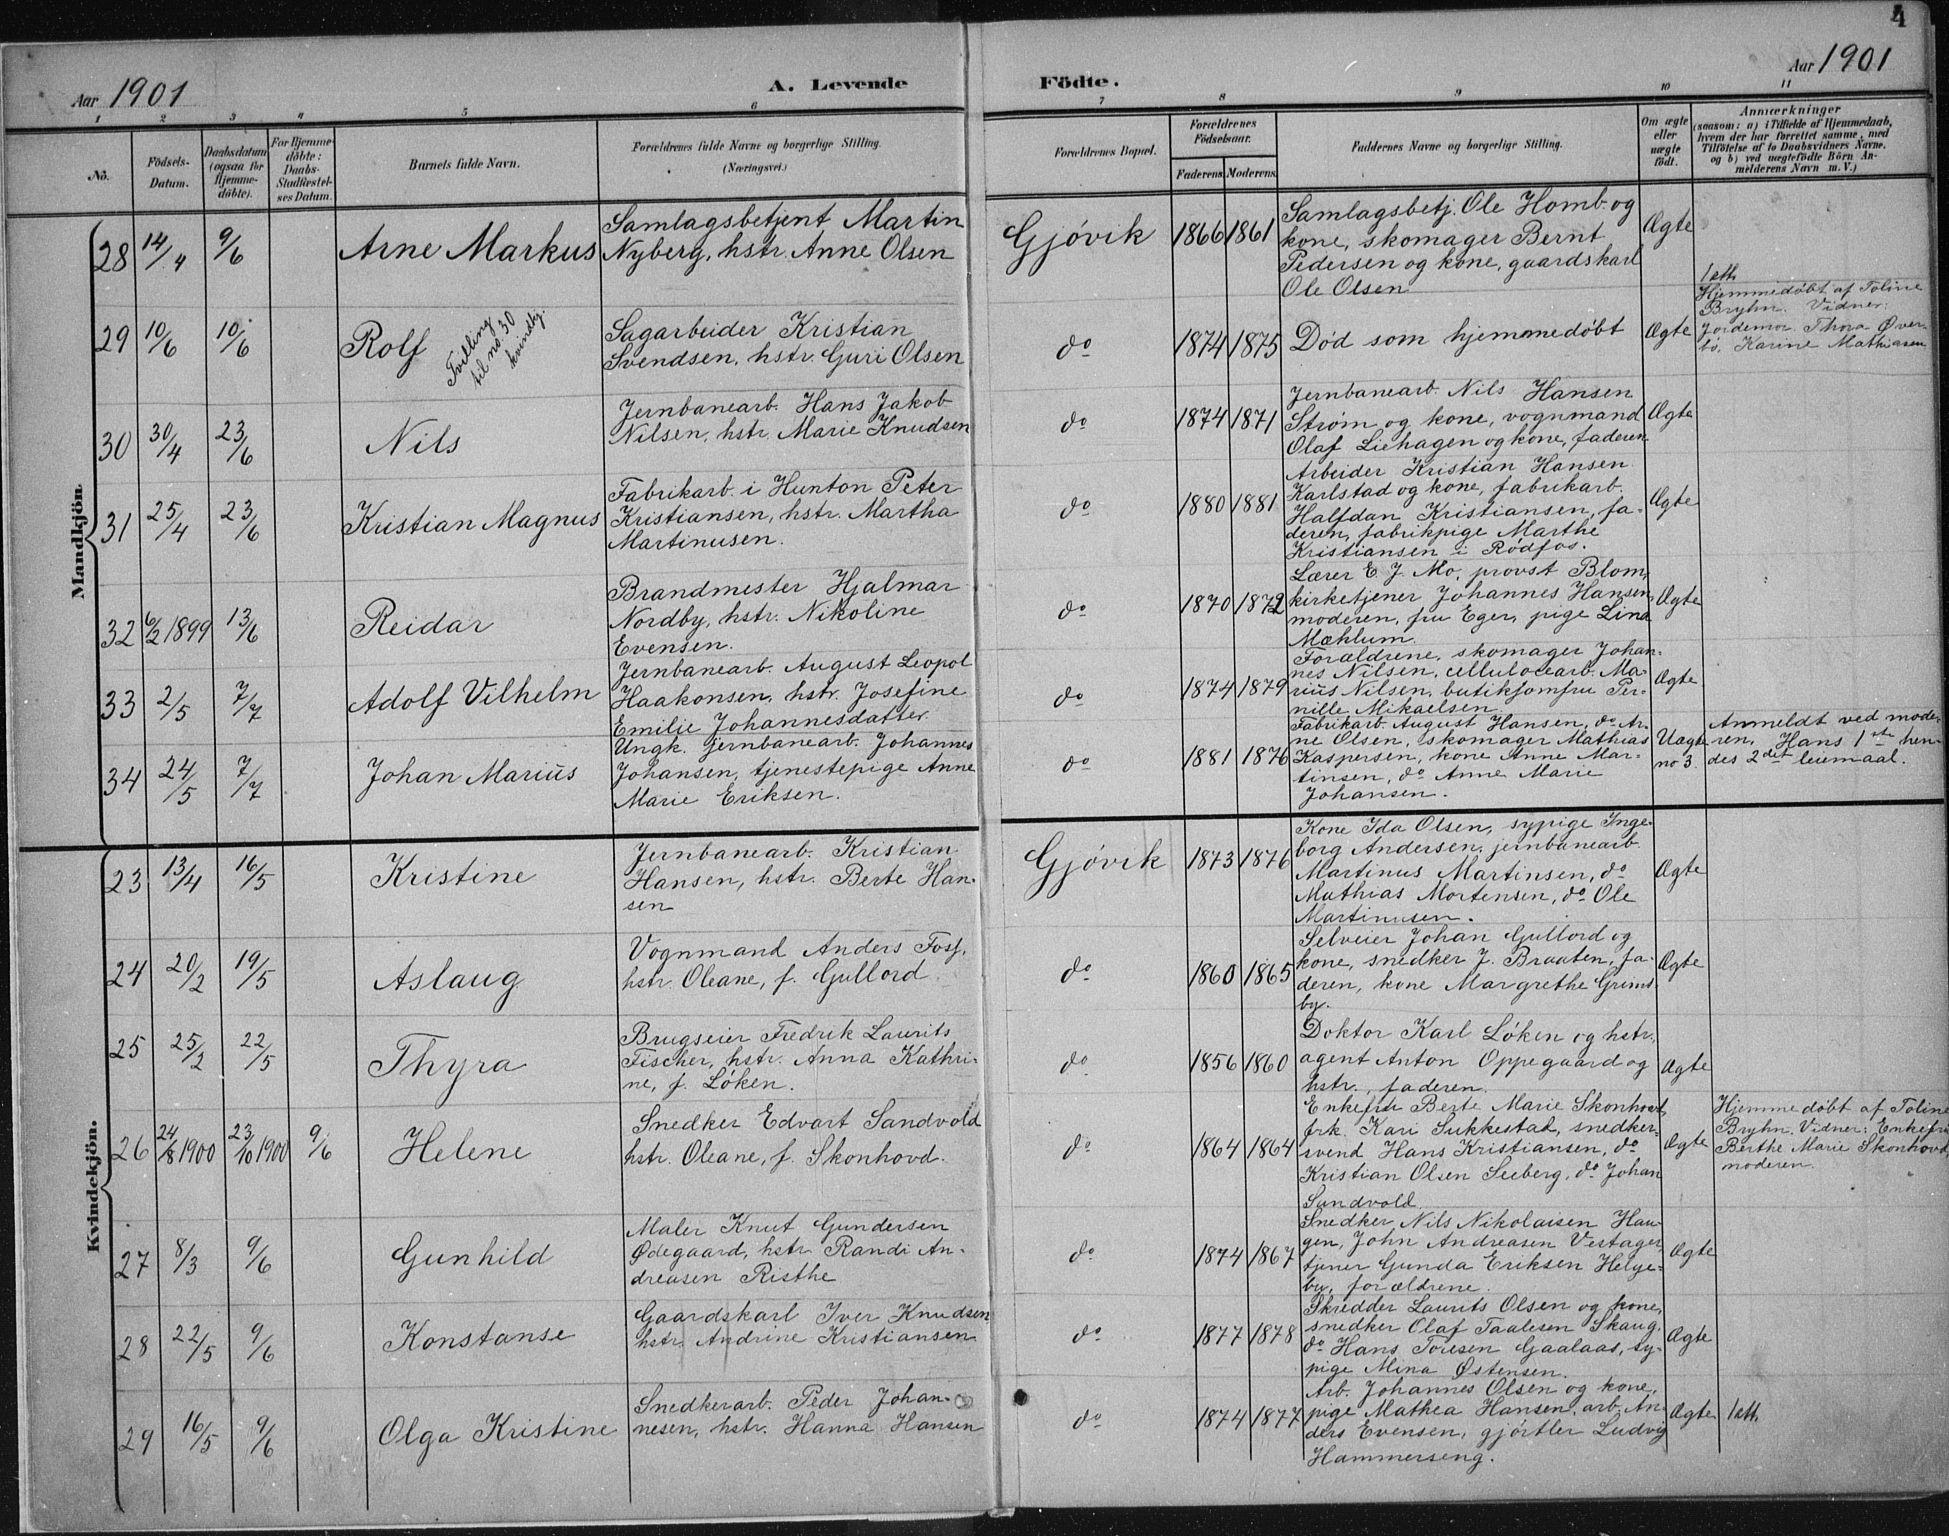 SAH, Vardal prestekontor, H/Ha/Haa/L0013: Ministerialbok nr. 13, 1901-1911, s. 4